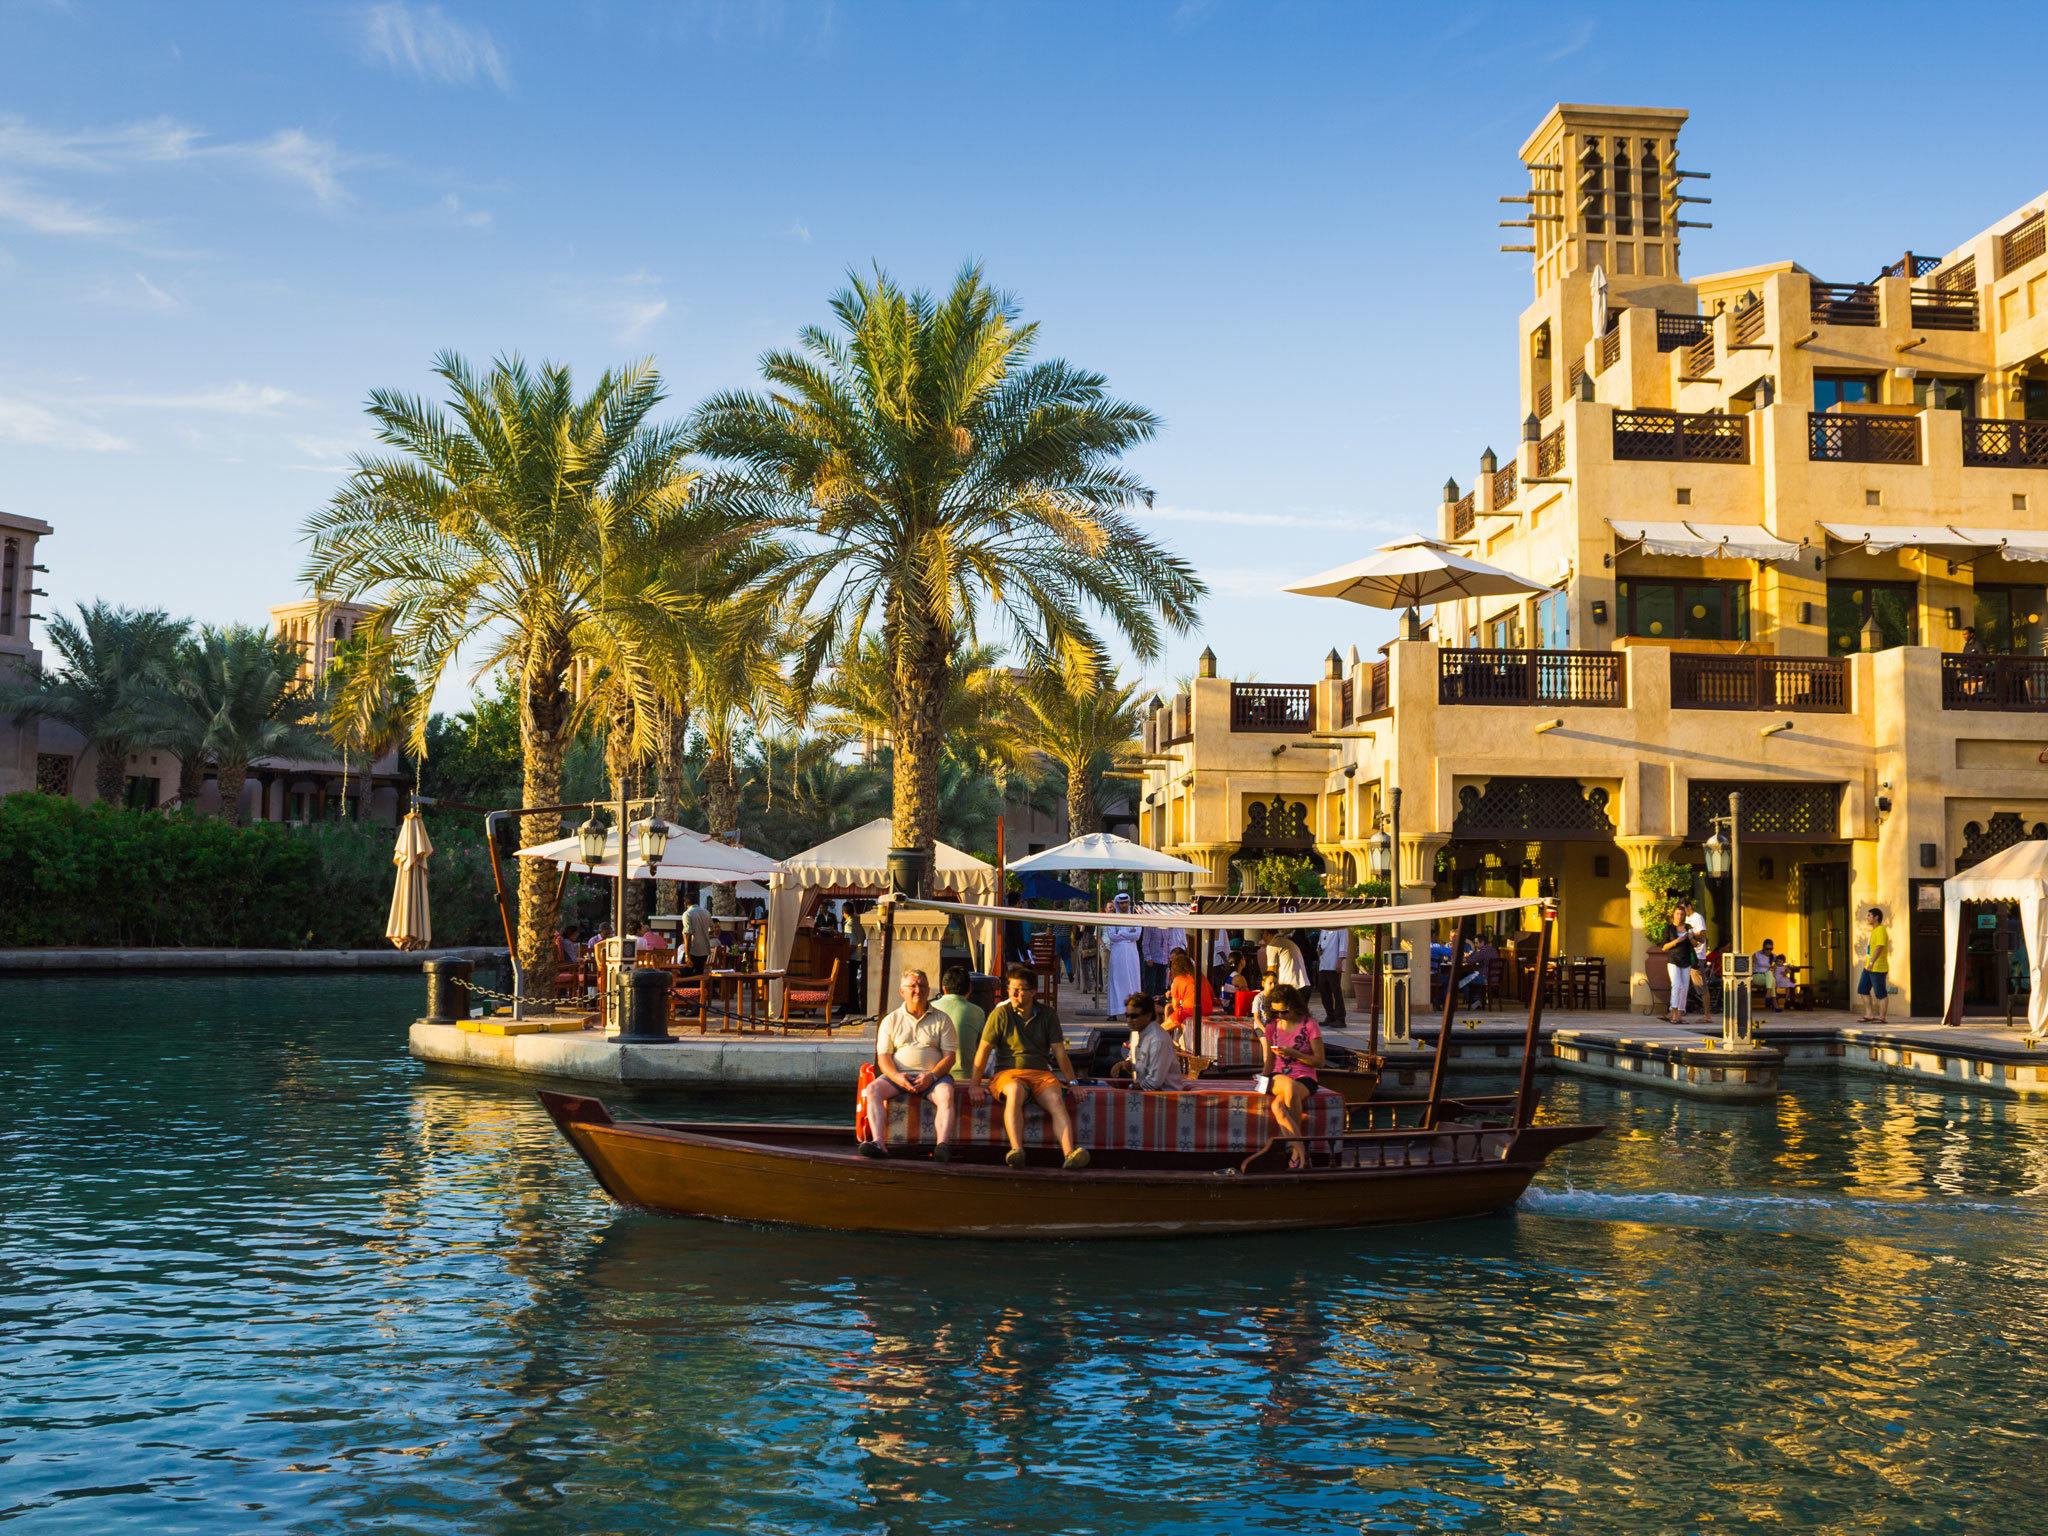 Entre los 50 barrios más cool del mundo está Dubai Marina y Jumeirah Beach Residence en Dubai